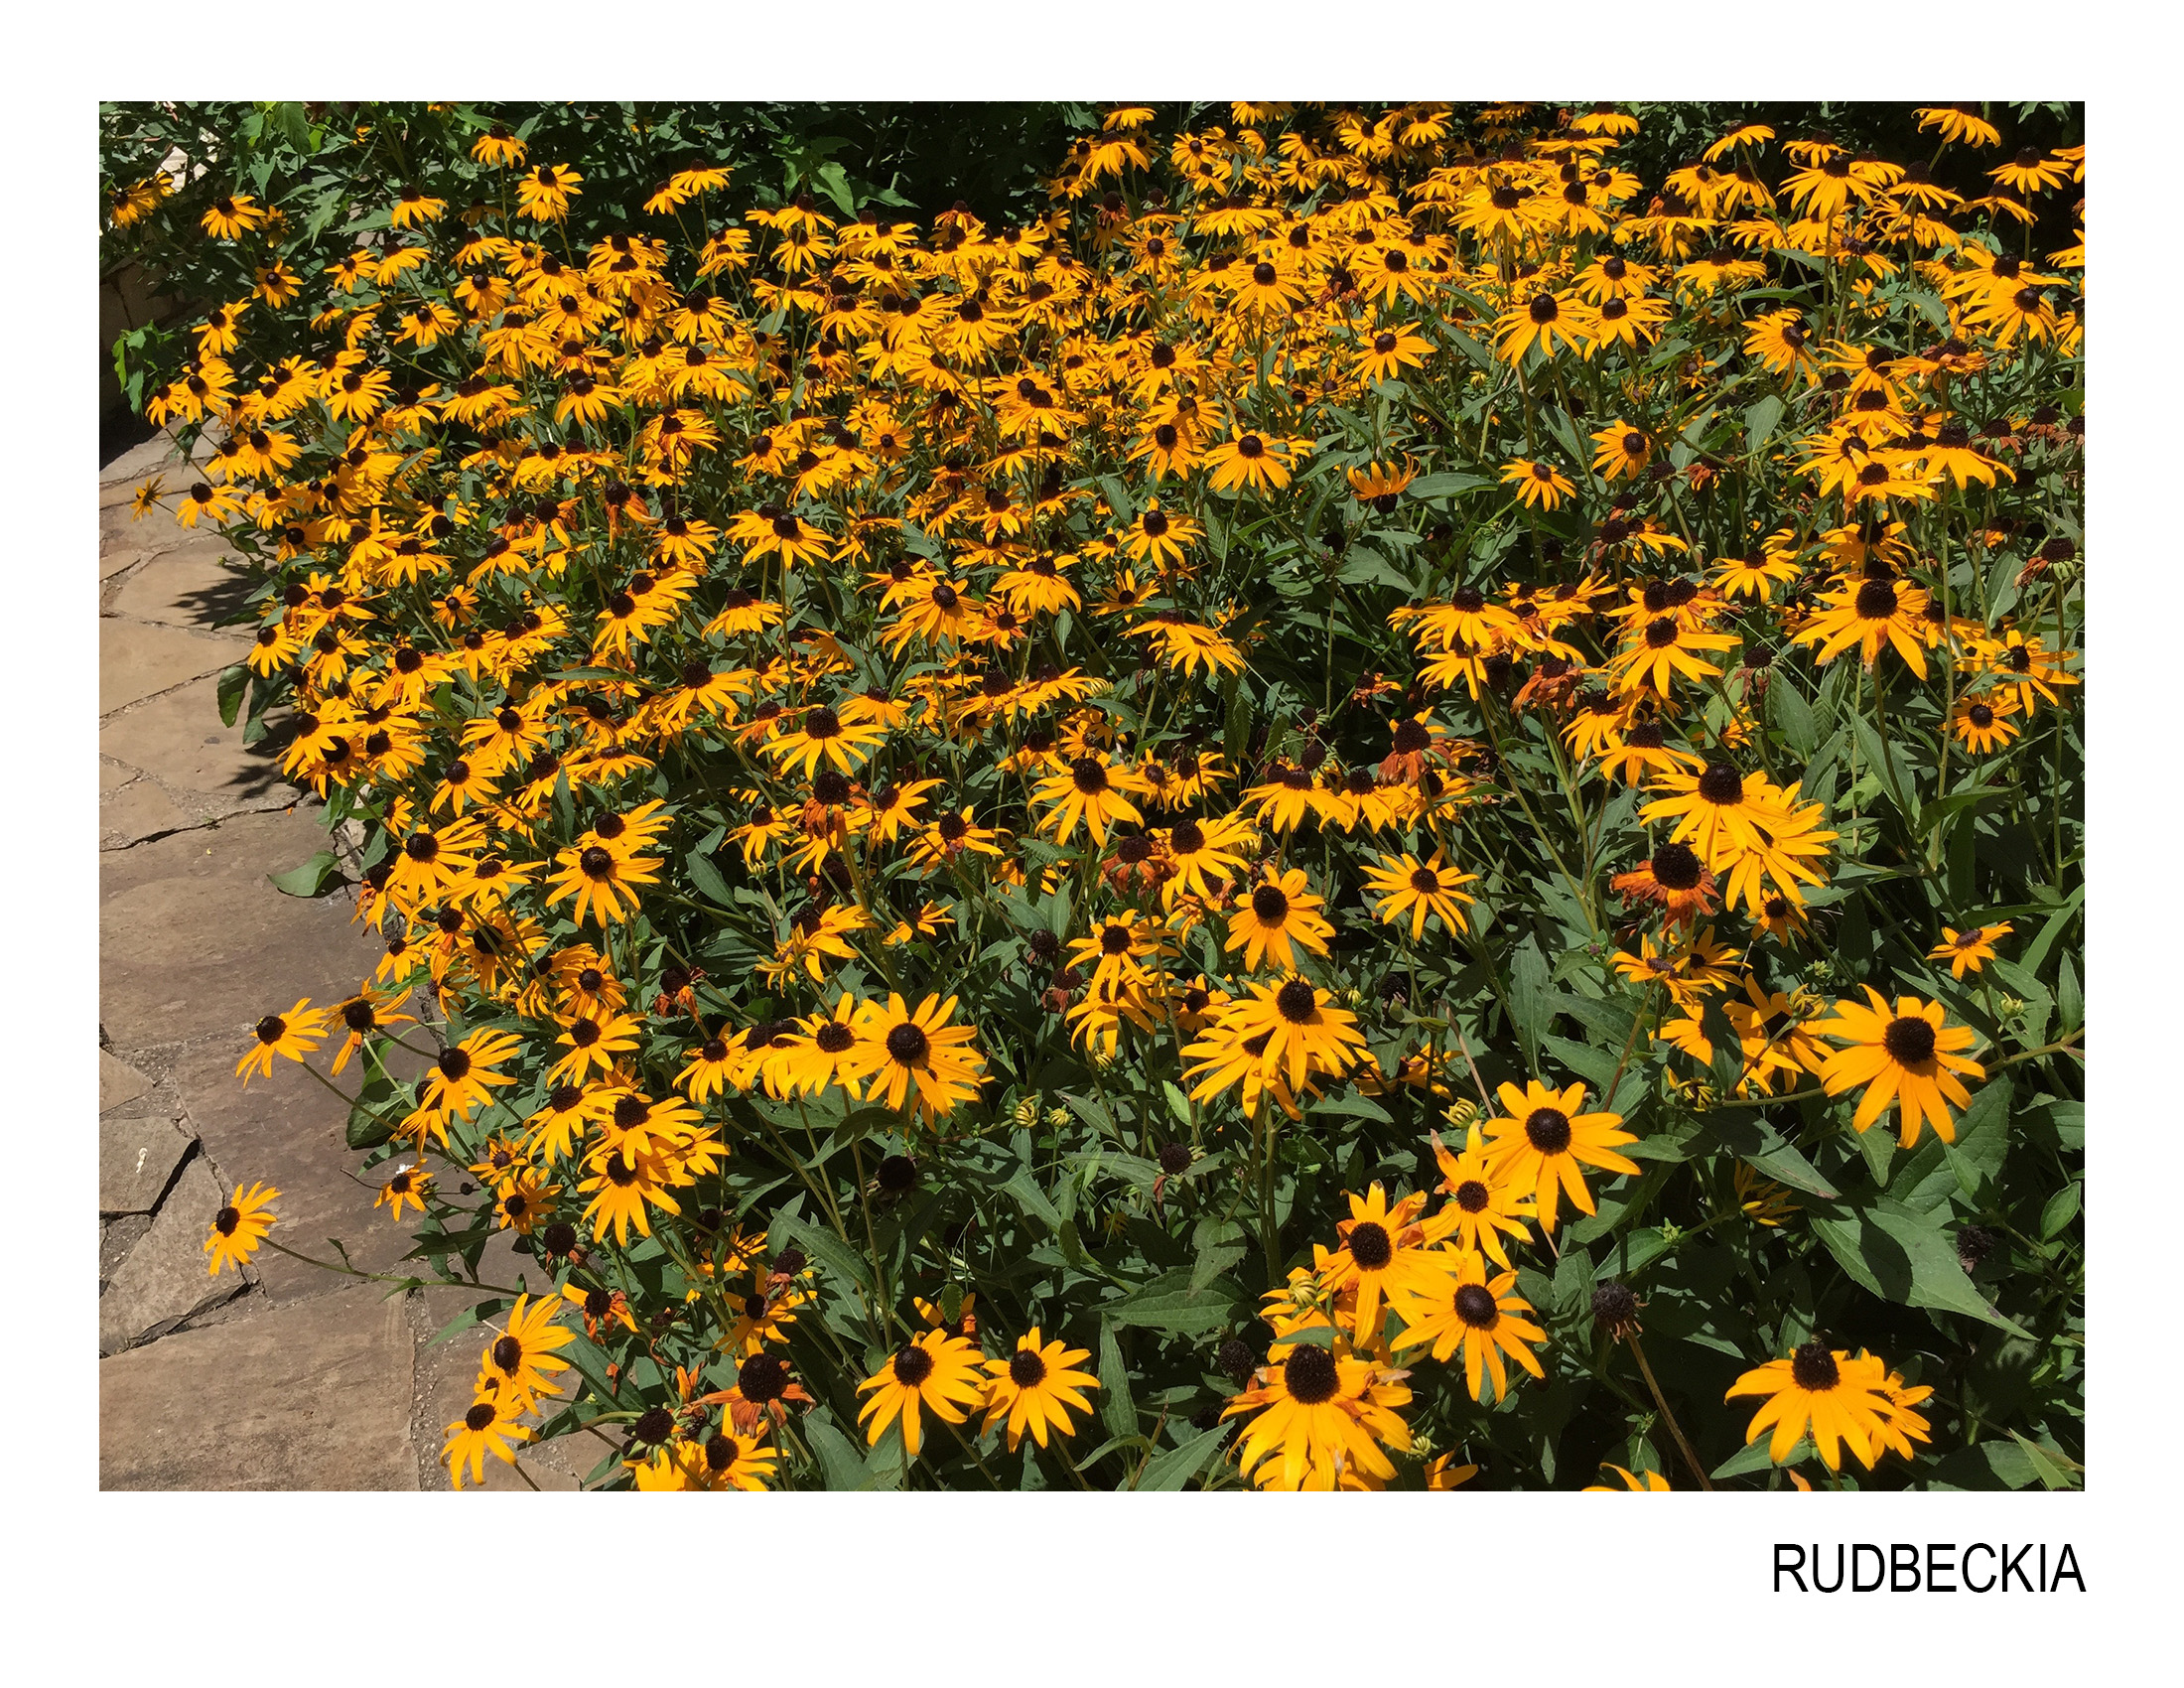 rudbeckia.jpg